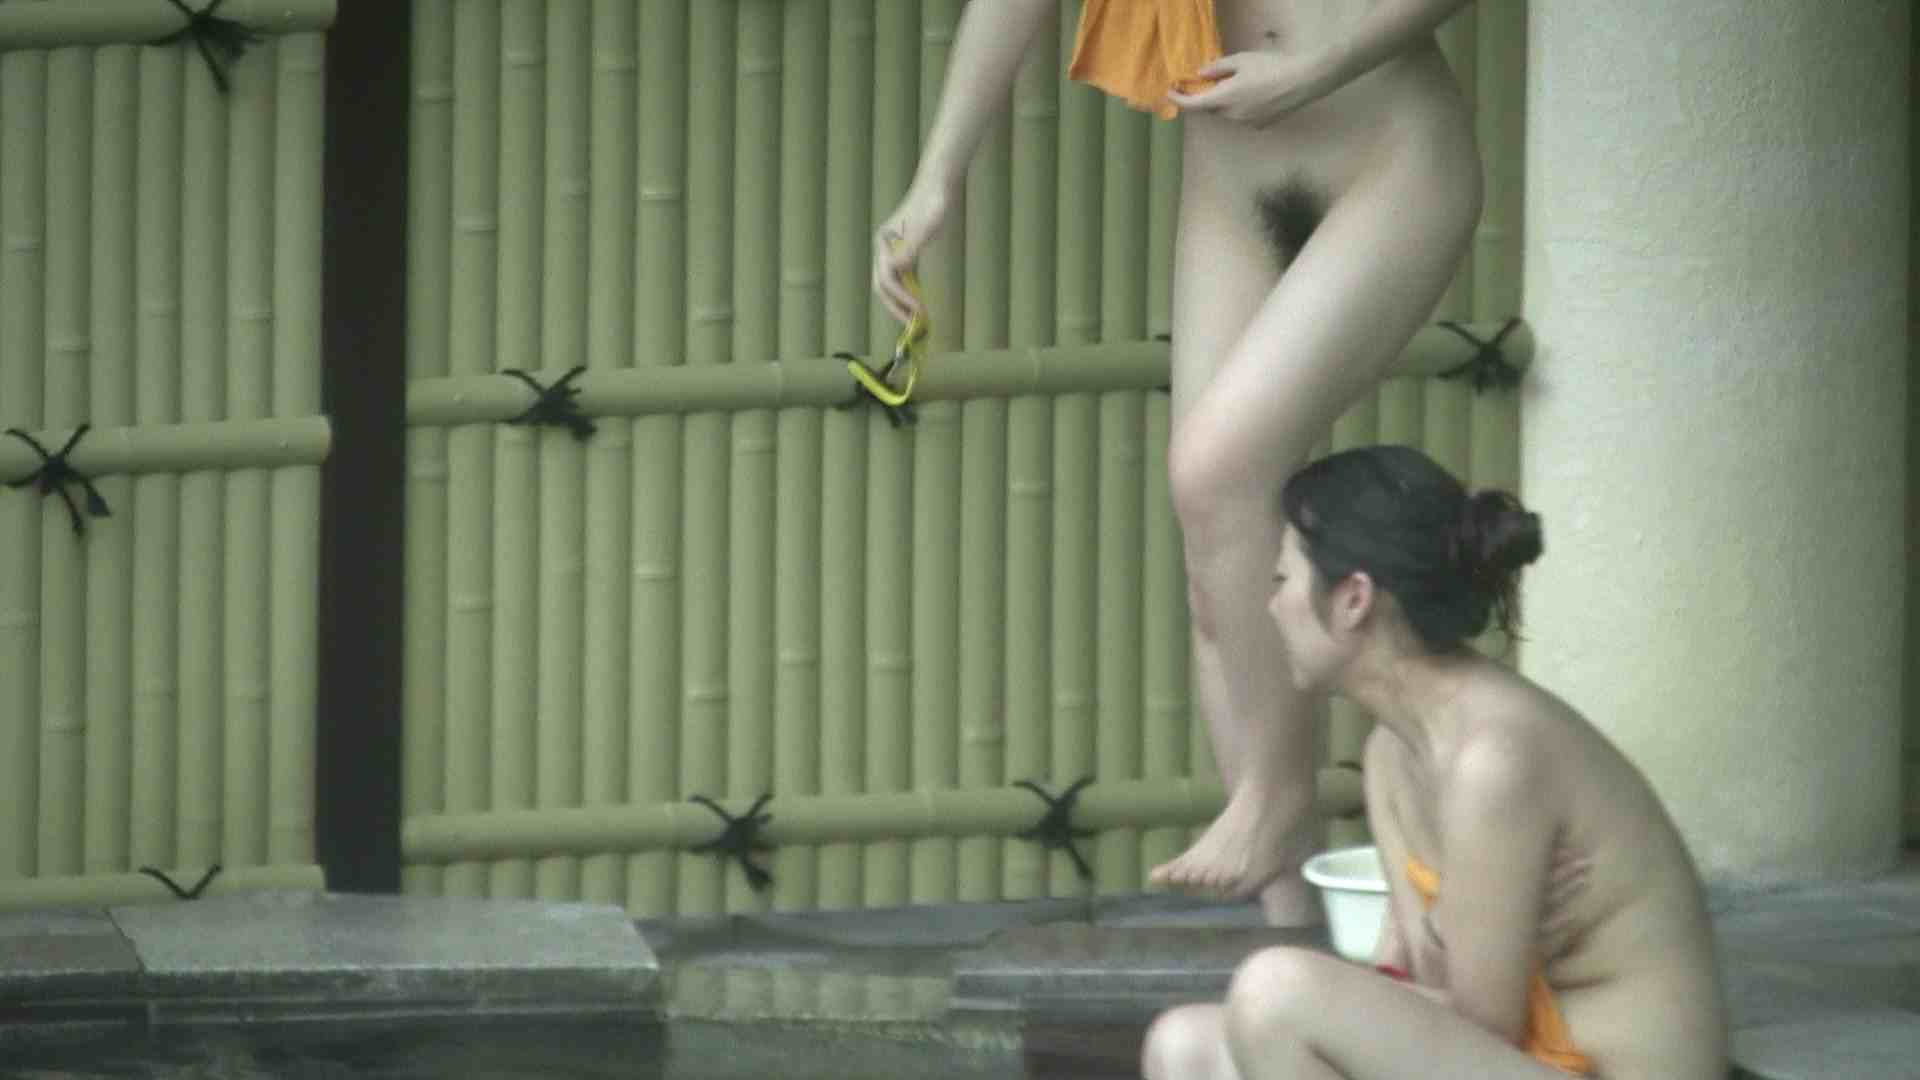 Aquaな露天風呂Vol.194 露天風呂編  110PIX 46